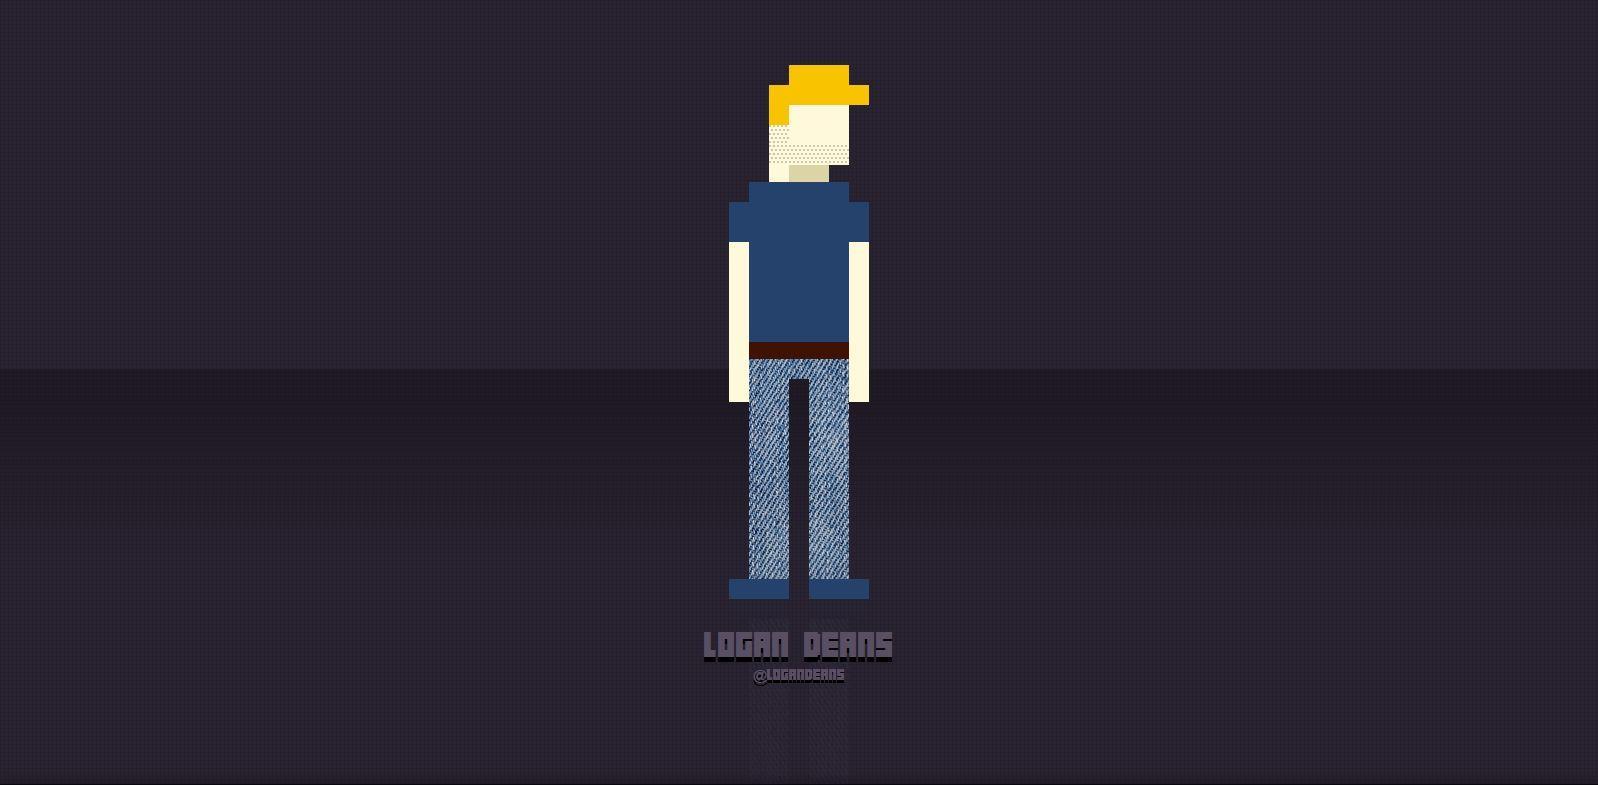 Logan Deans